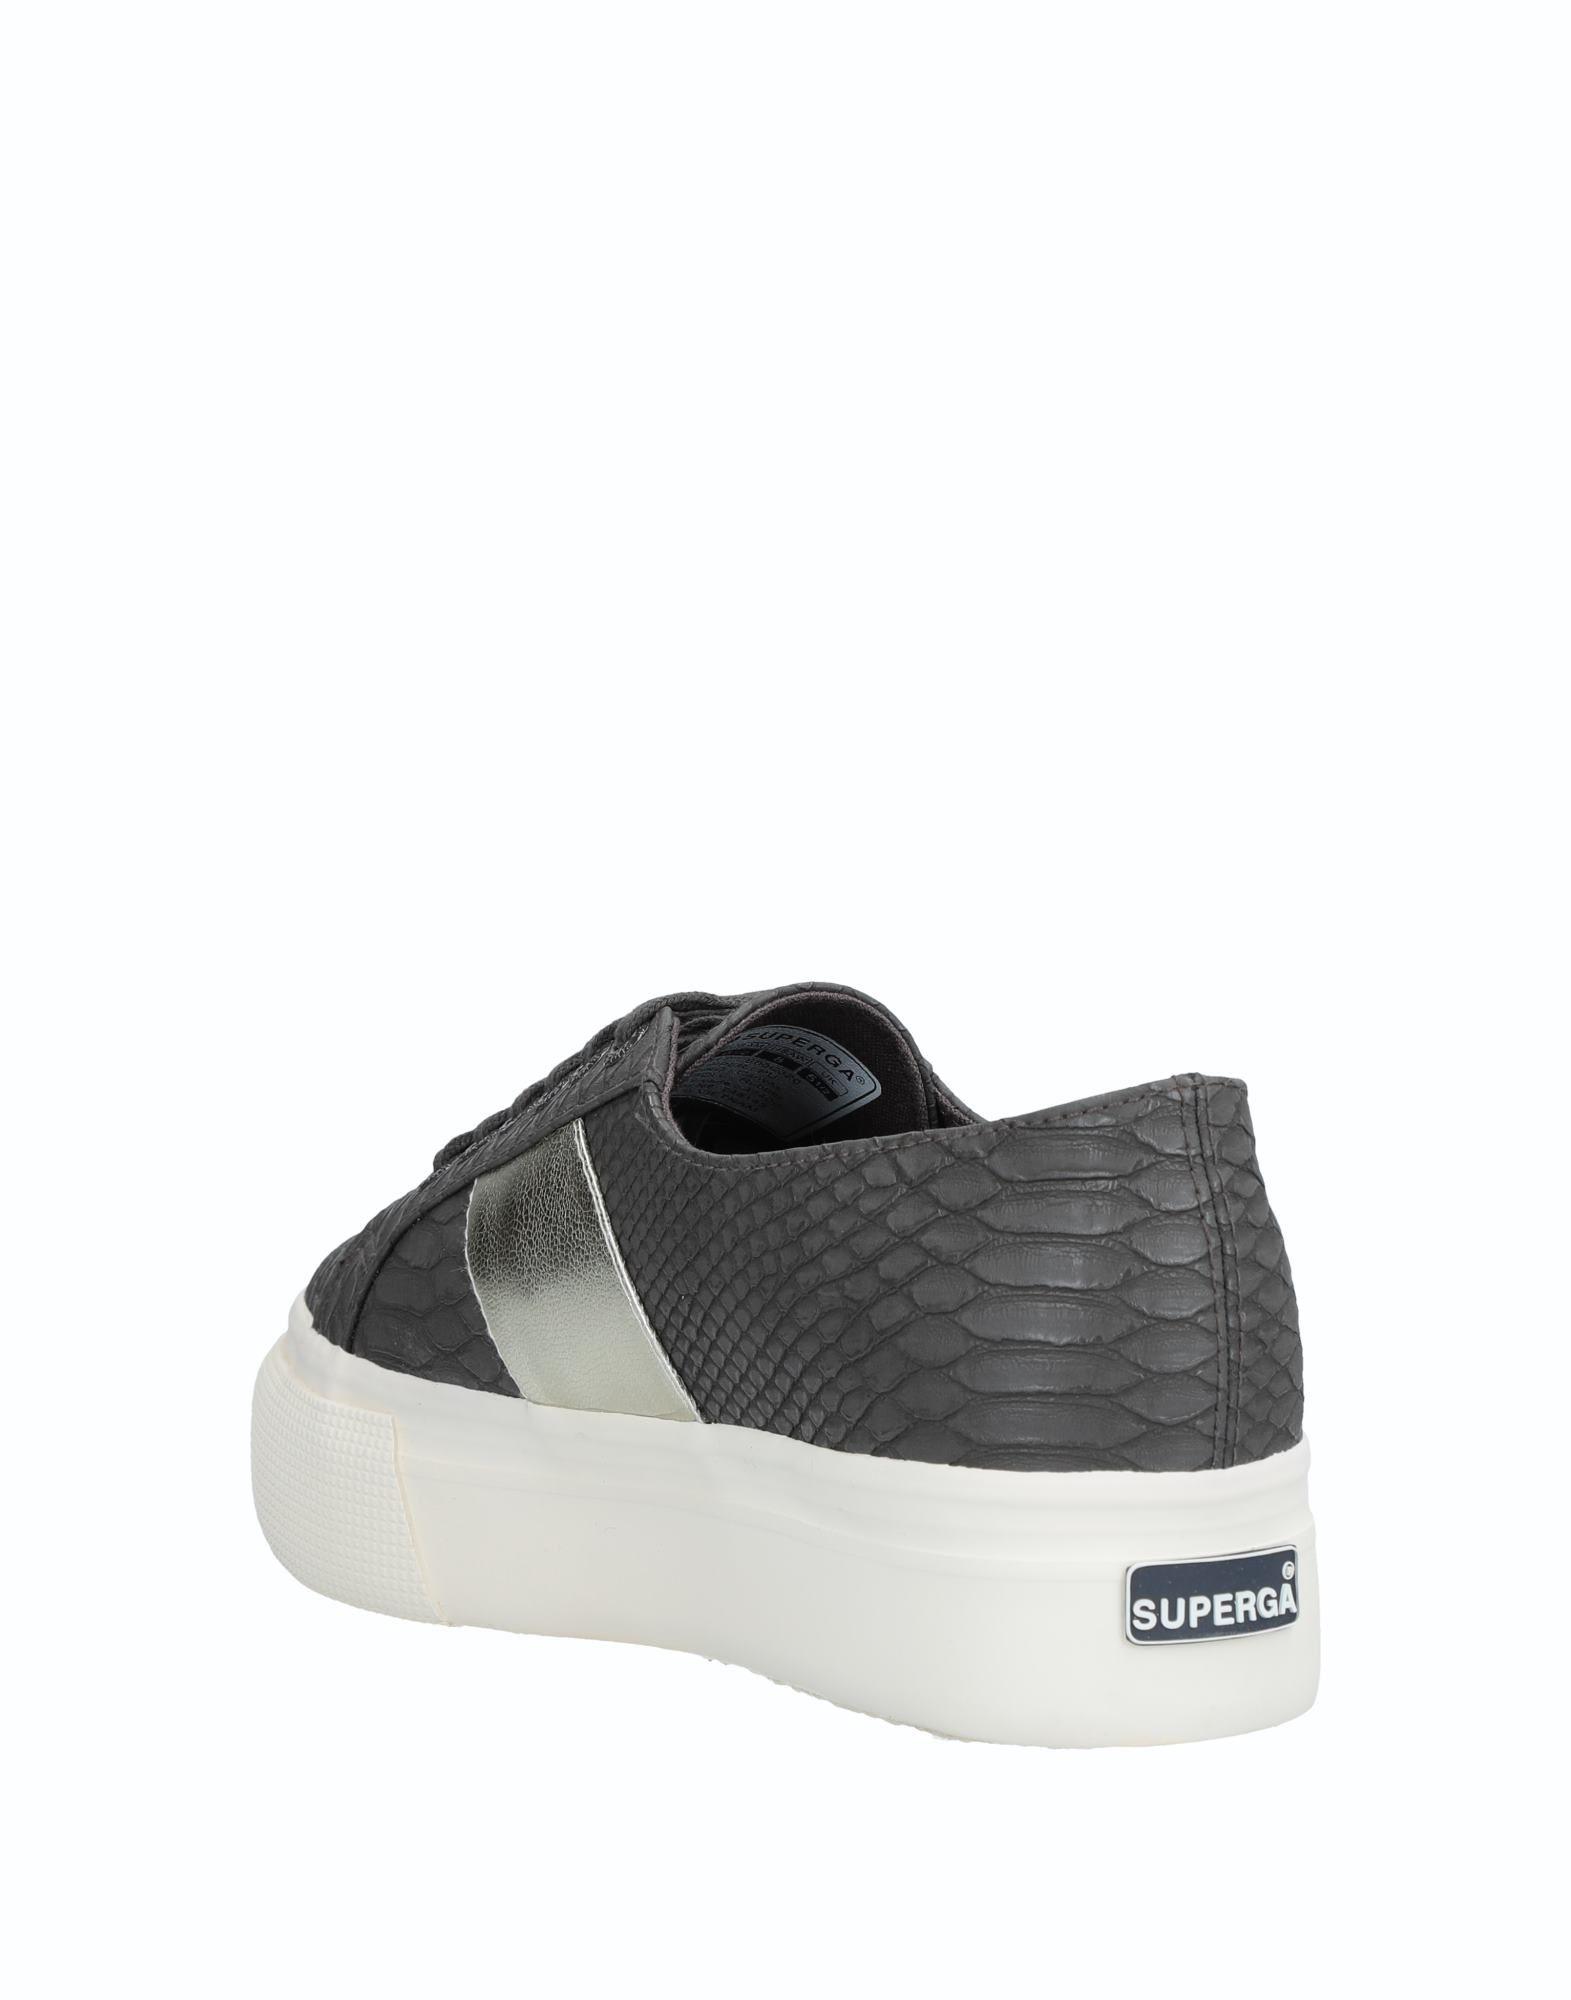 Damen Superga® Sneakers Damen   11538116CC Heiße Schuhe 798142